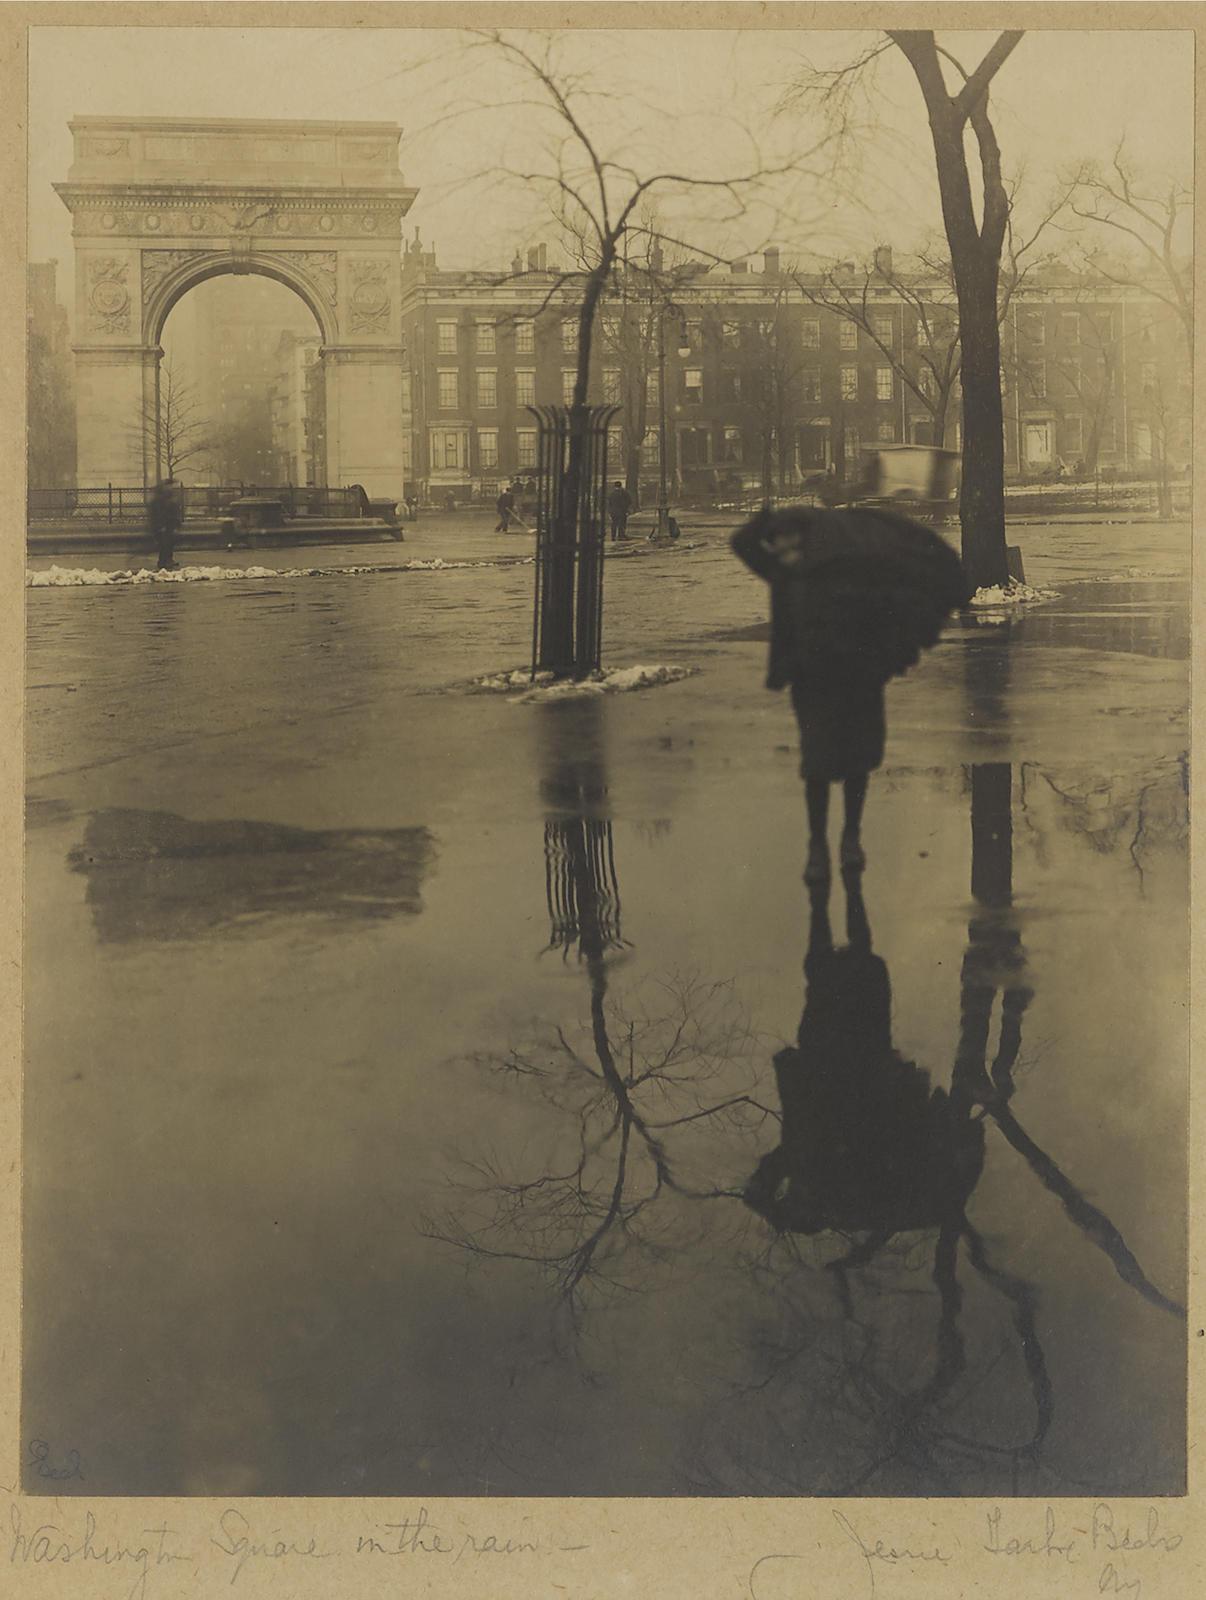 Jessie Tarbox Beals-Washington Square In The Rain-1910